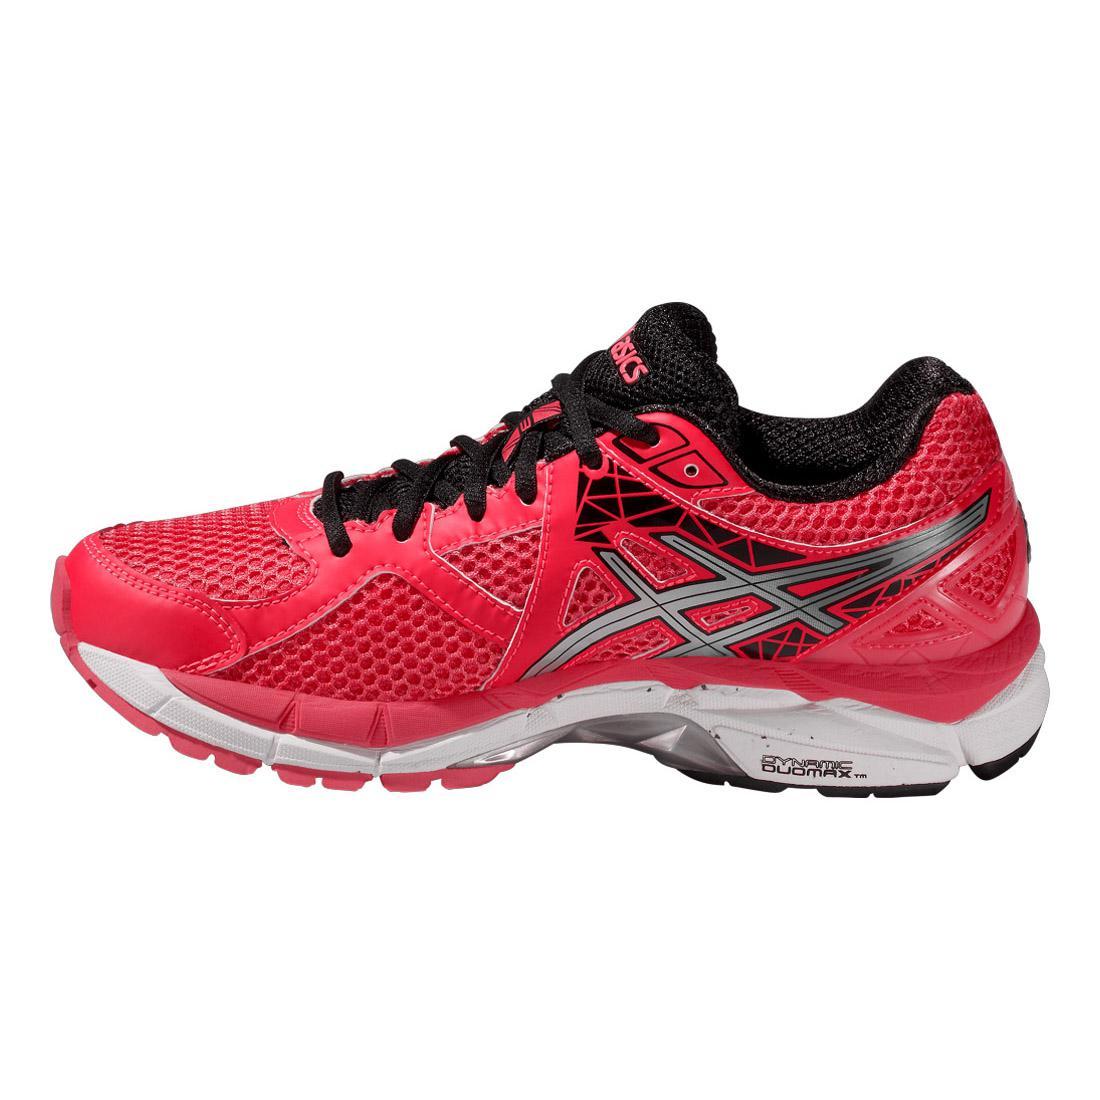 Asics Womens GT-2000 3 Running Shoes - Pink/Black